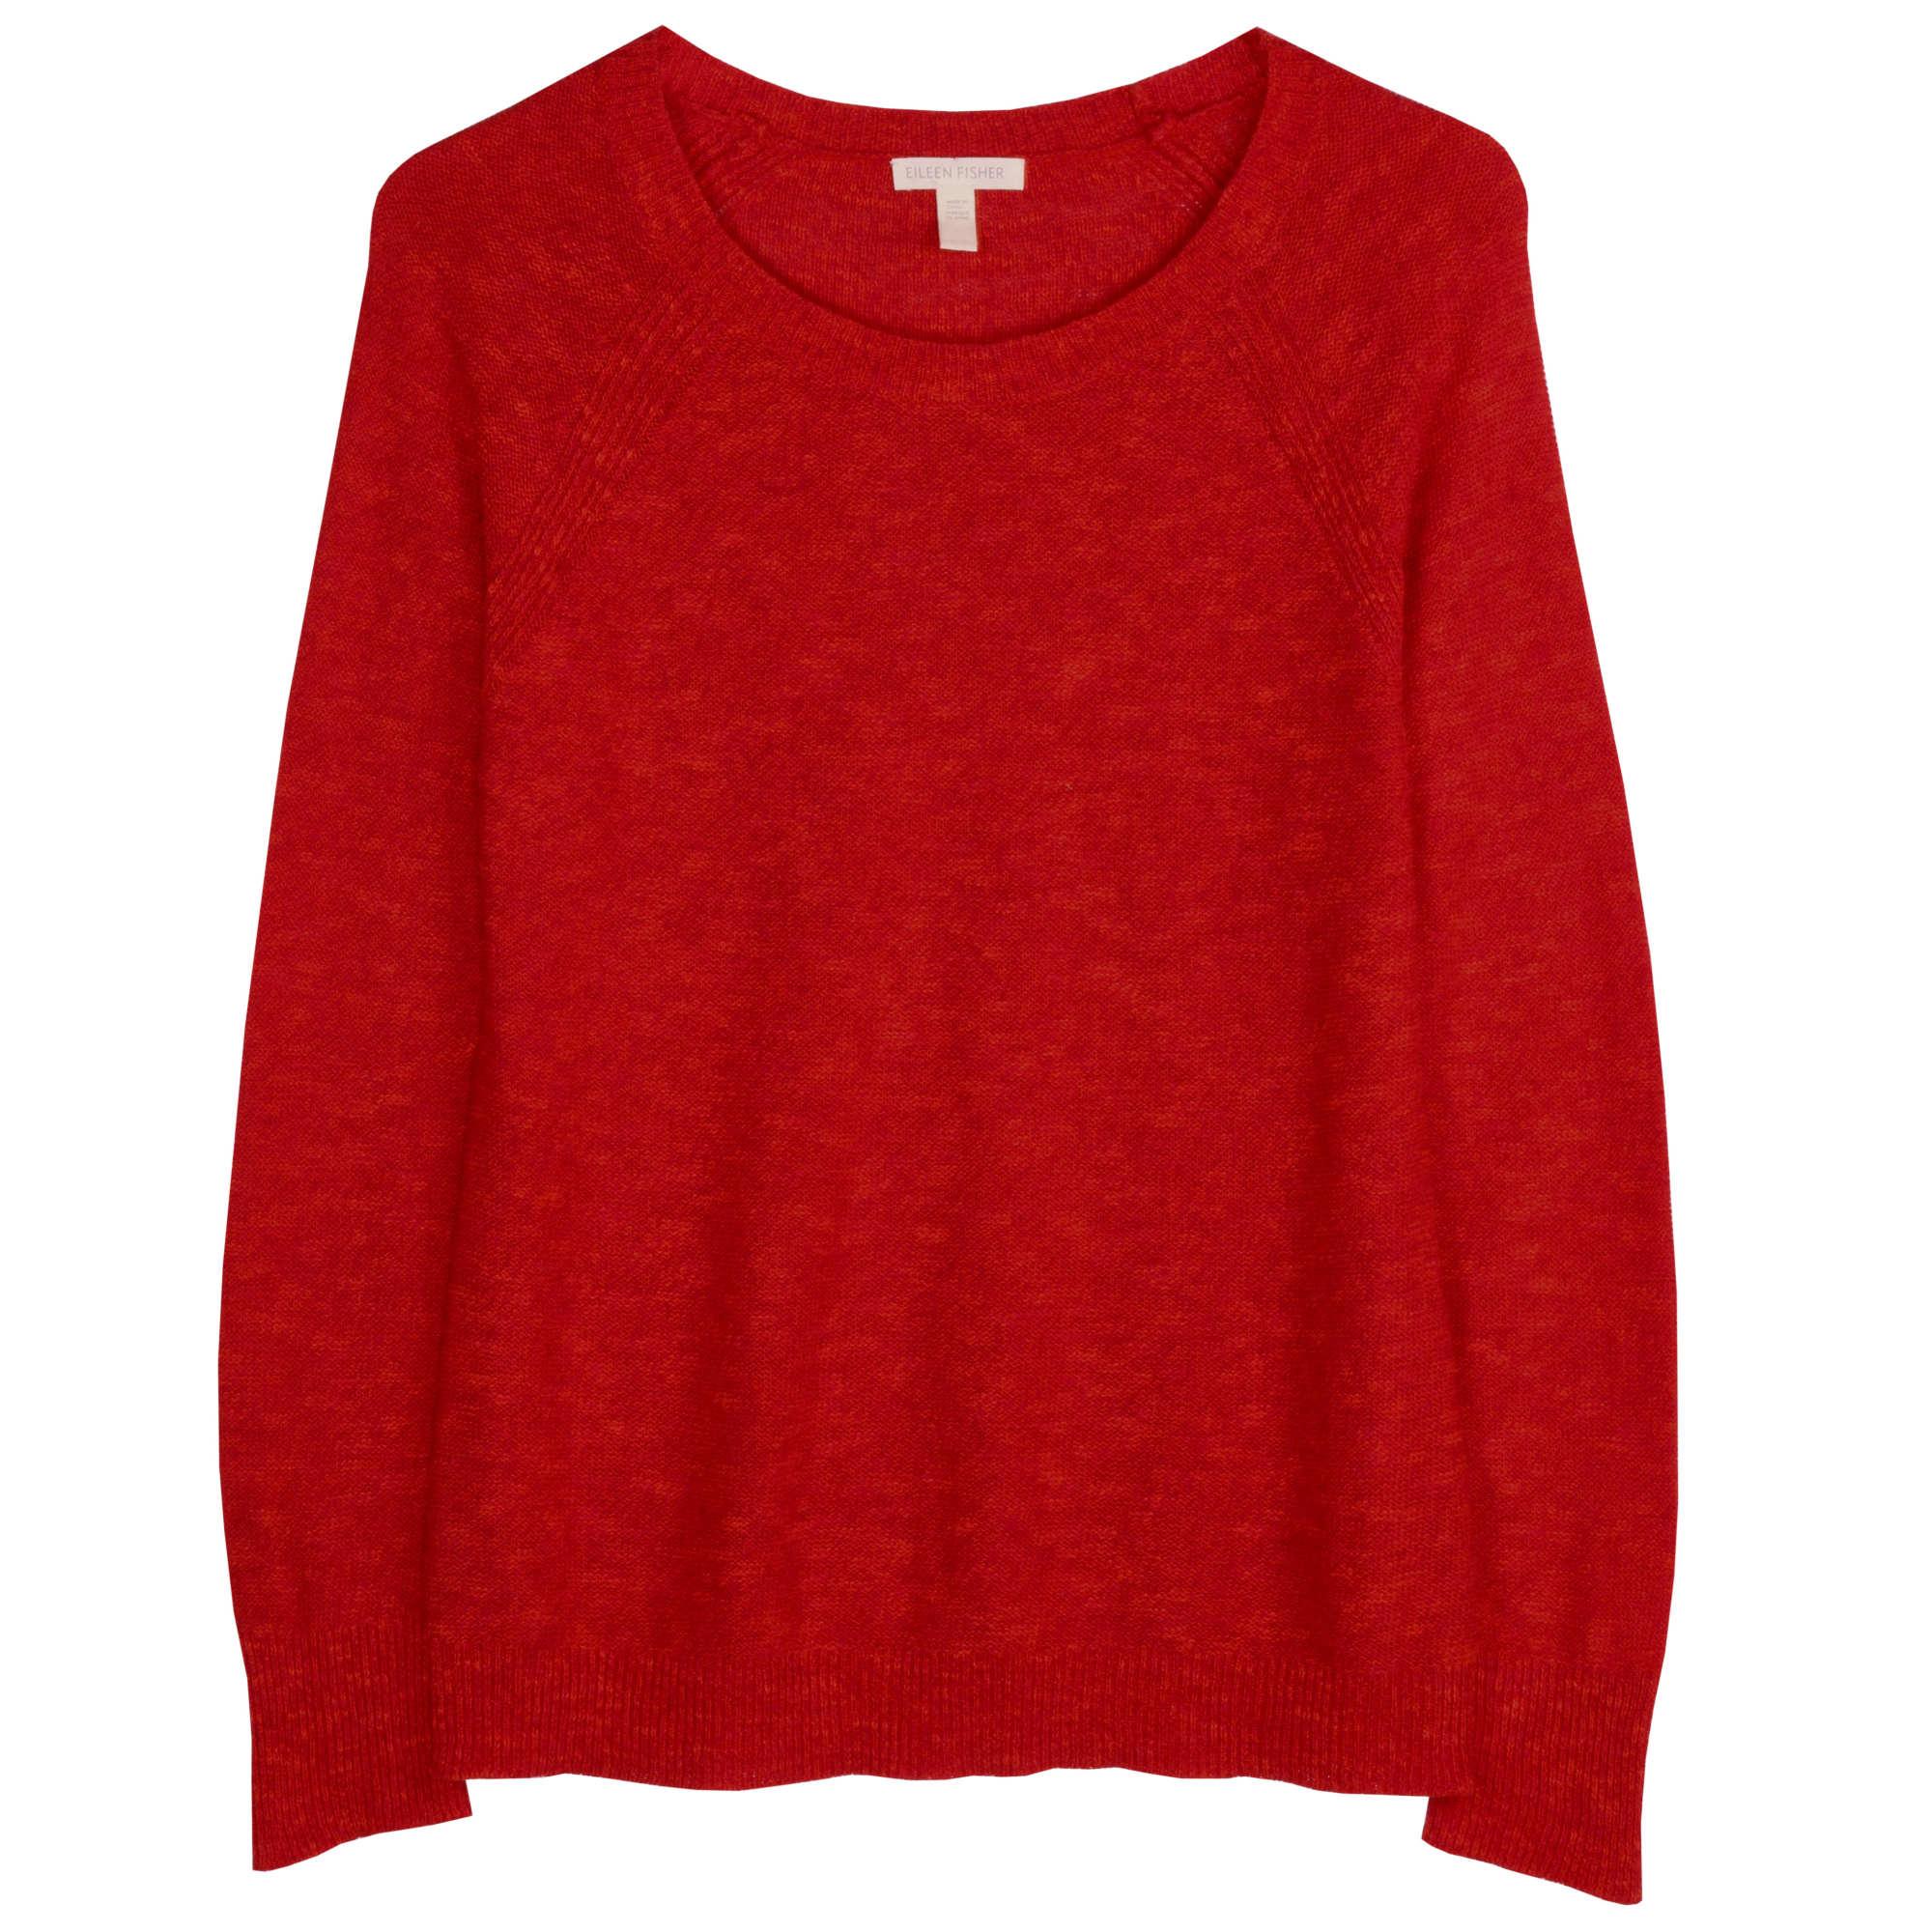 Organic Linen Cotton Slub Texture Pullover